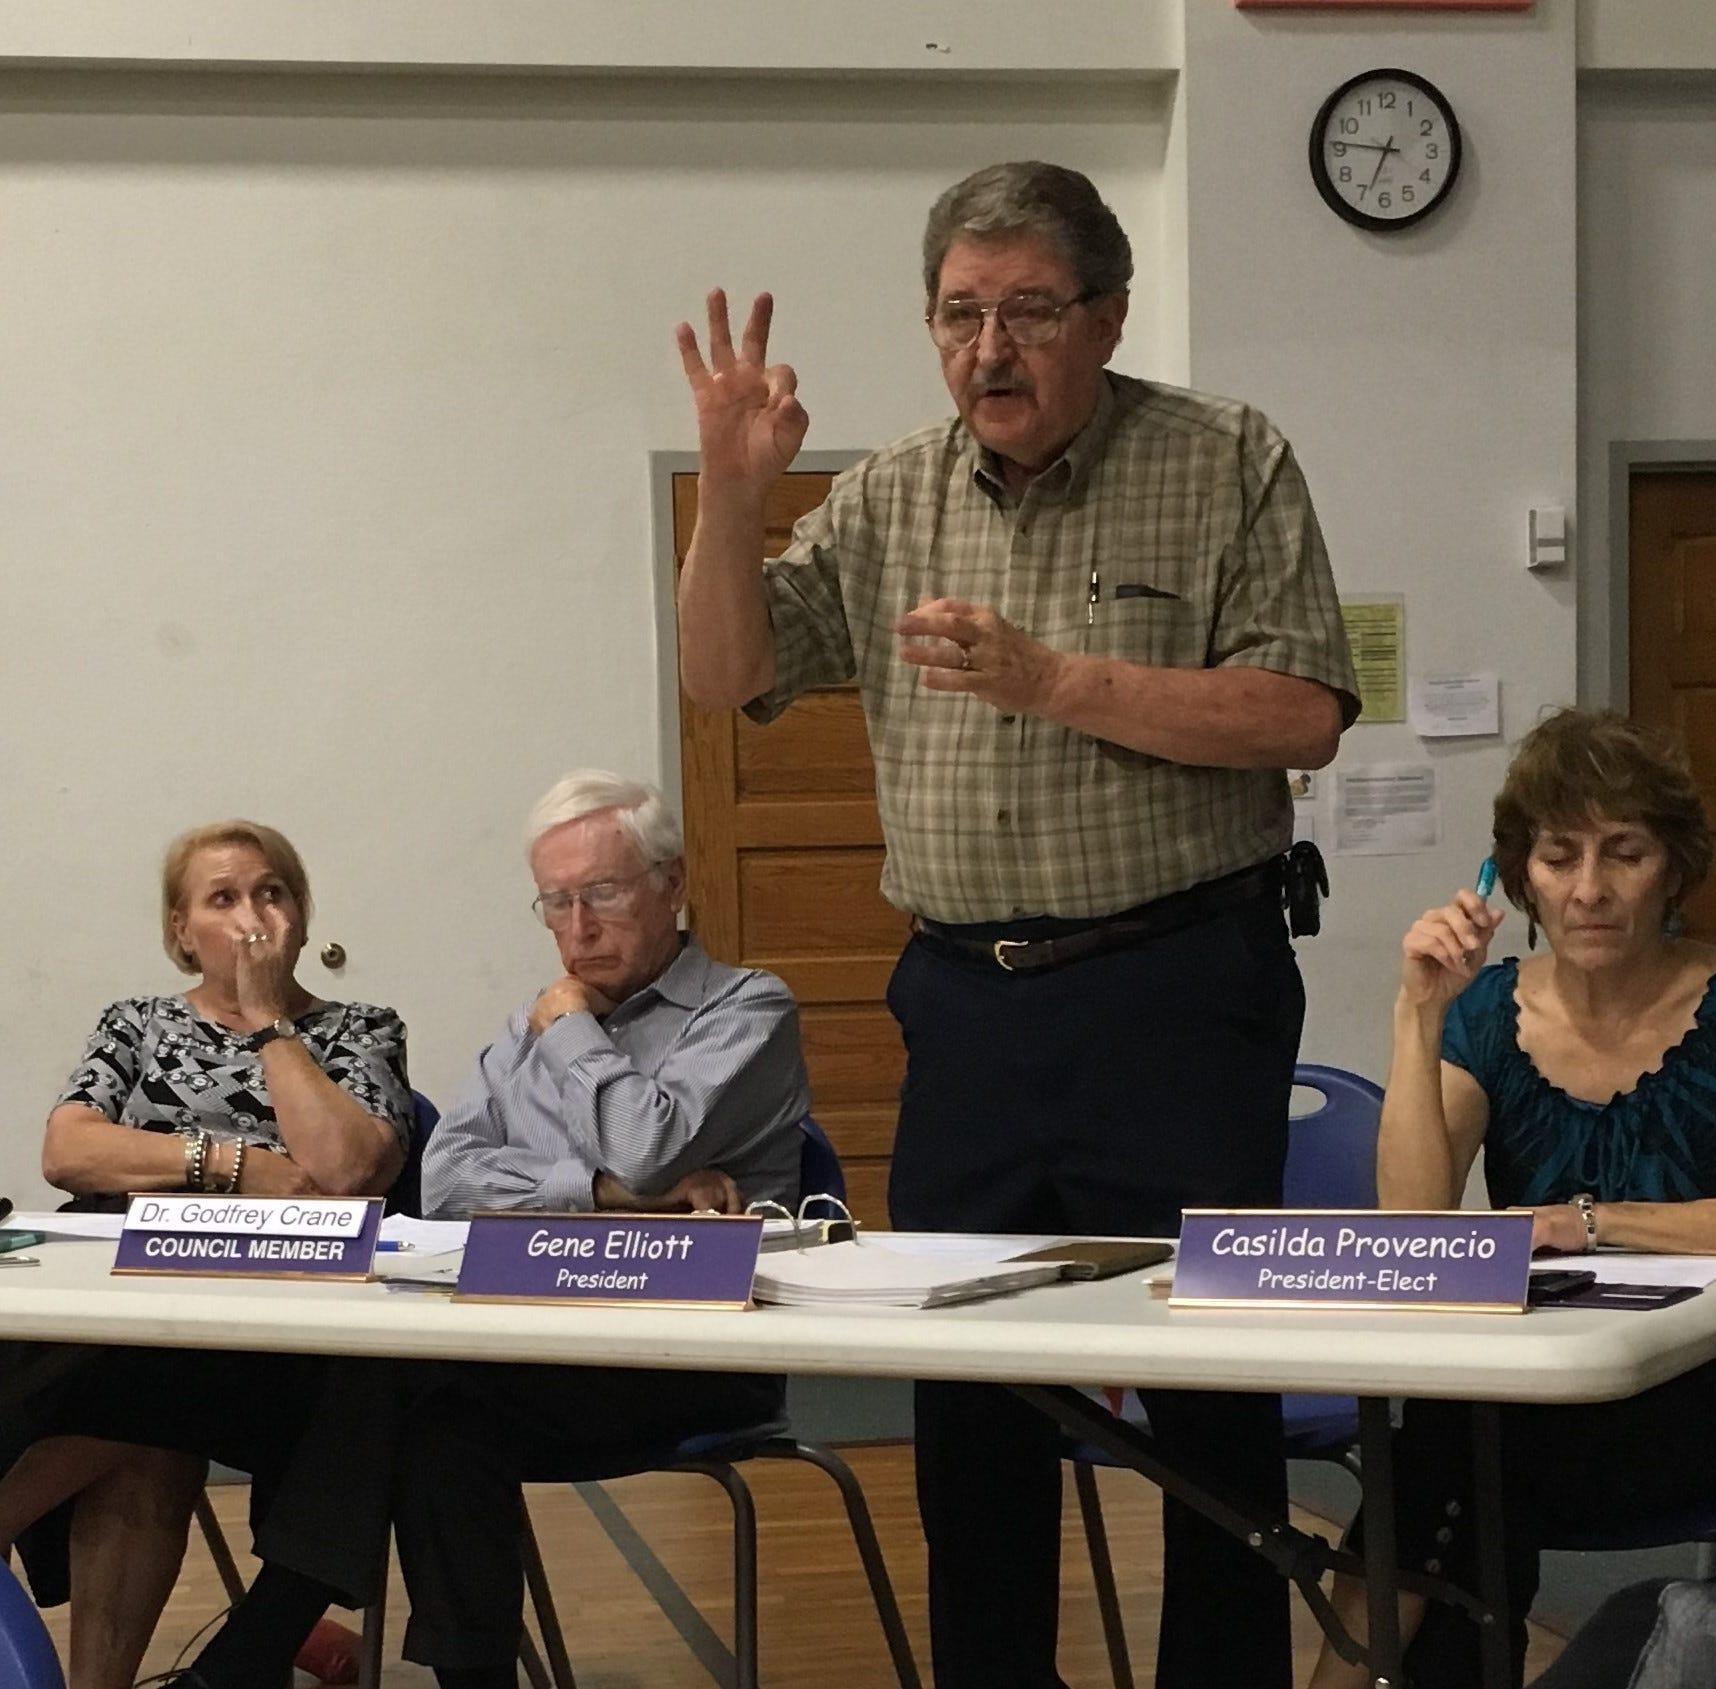 From left, Alma d'Arte principal Holly Schullo and governing council members Karen Caroe, Godfrey Crane, Gene Elliott (speaking), and Casilda Provencio.